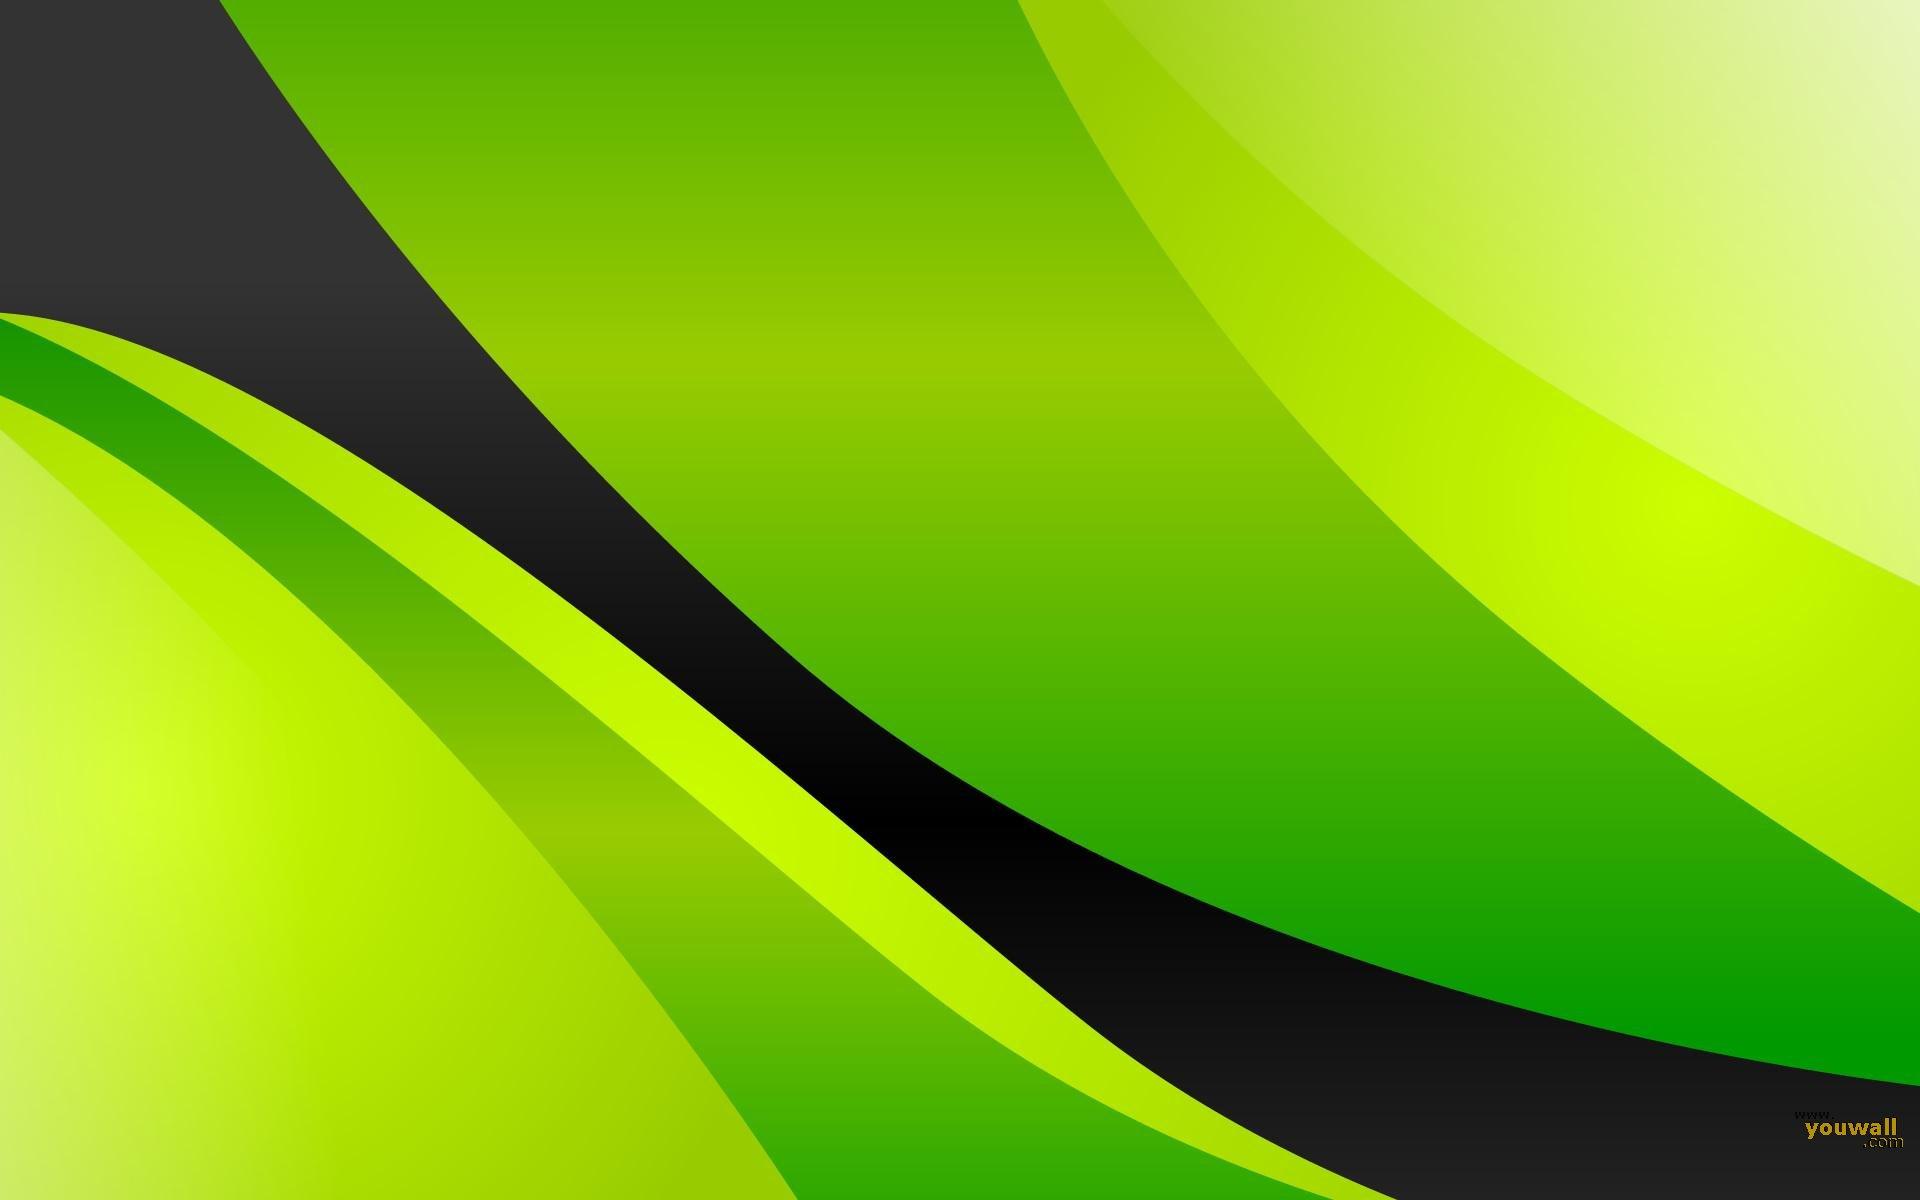 Windows Background Papel Green Vista Theme wallpapers HD   130534 1920x1200